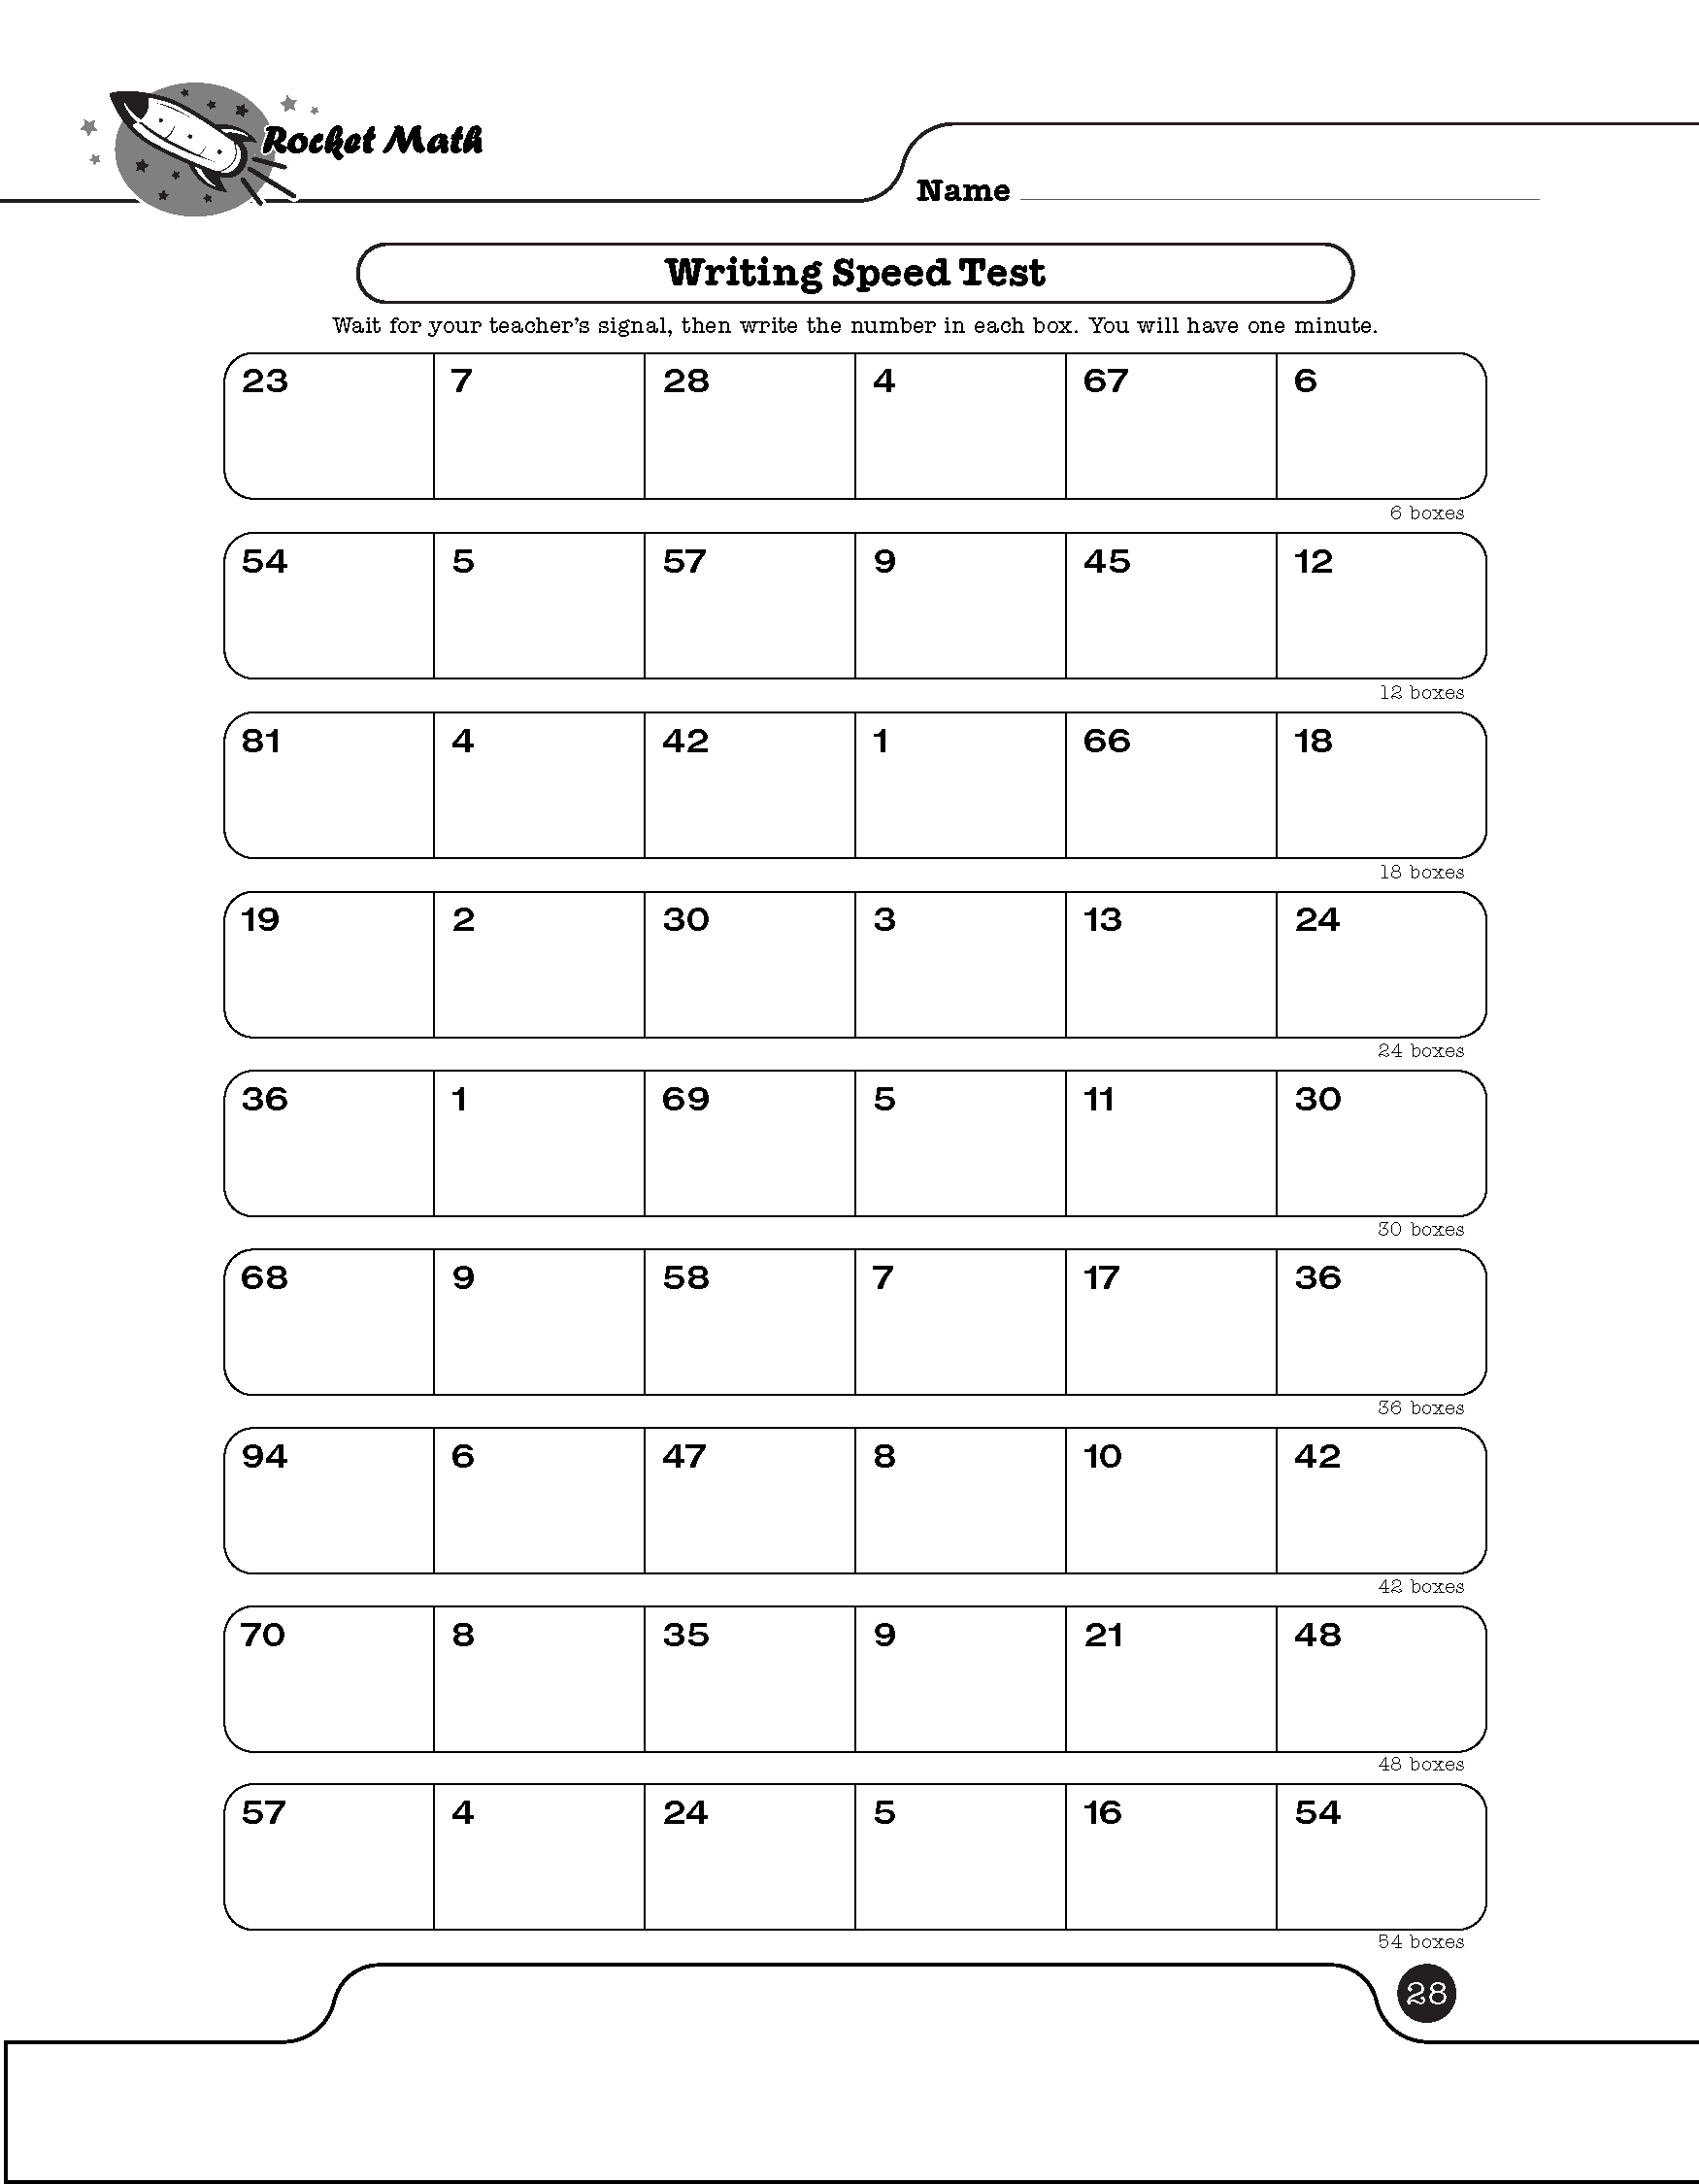 How Do I Set Up Rocket Math